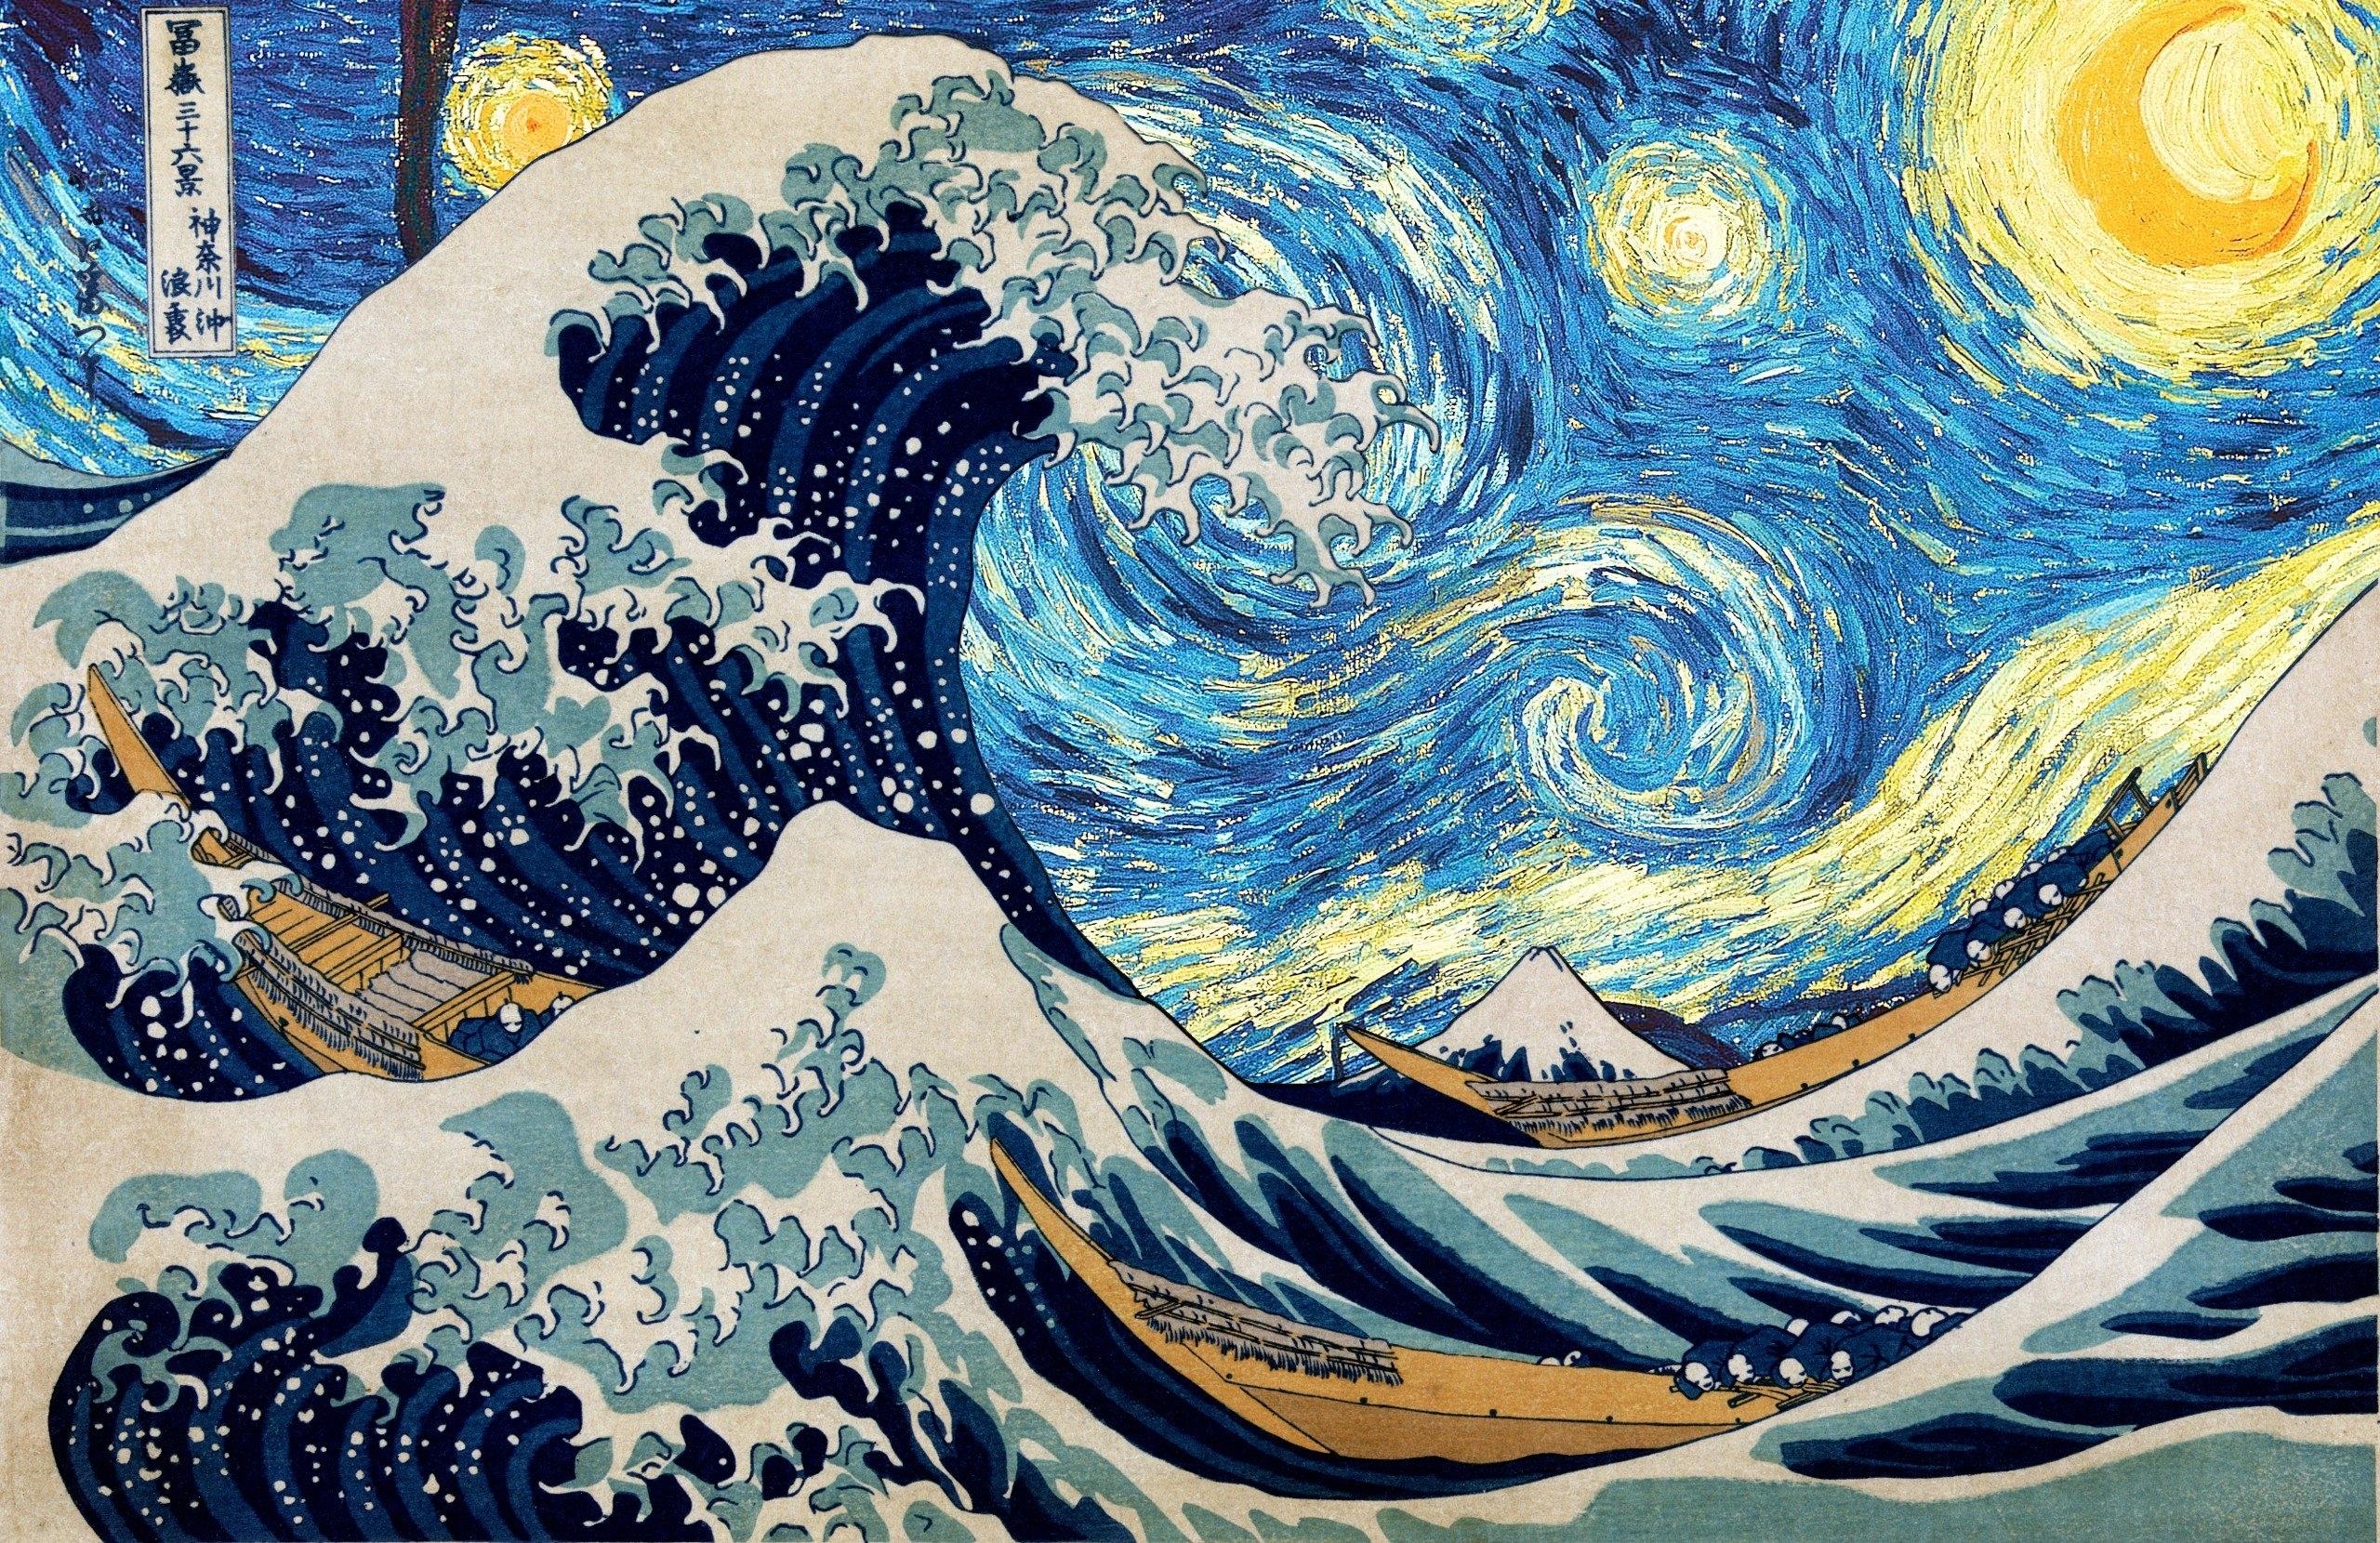 The Great Wave of Kanagawa Starry Night HD wallpaper